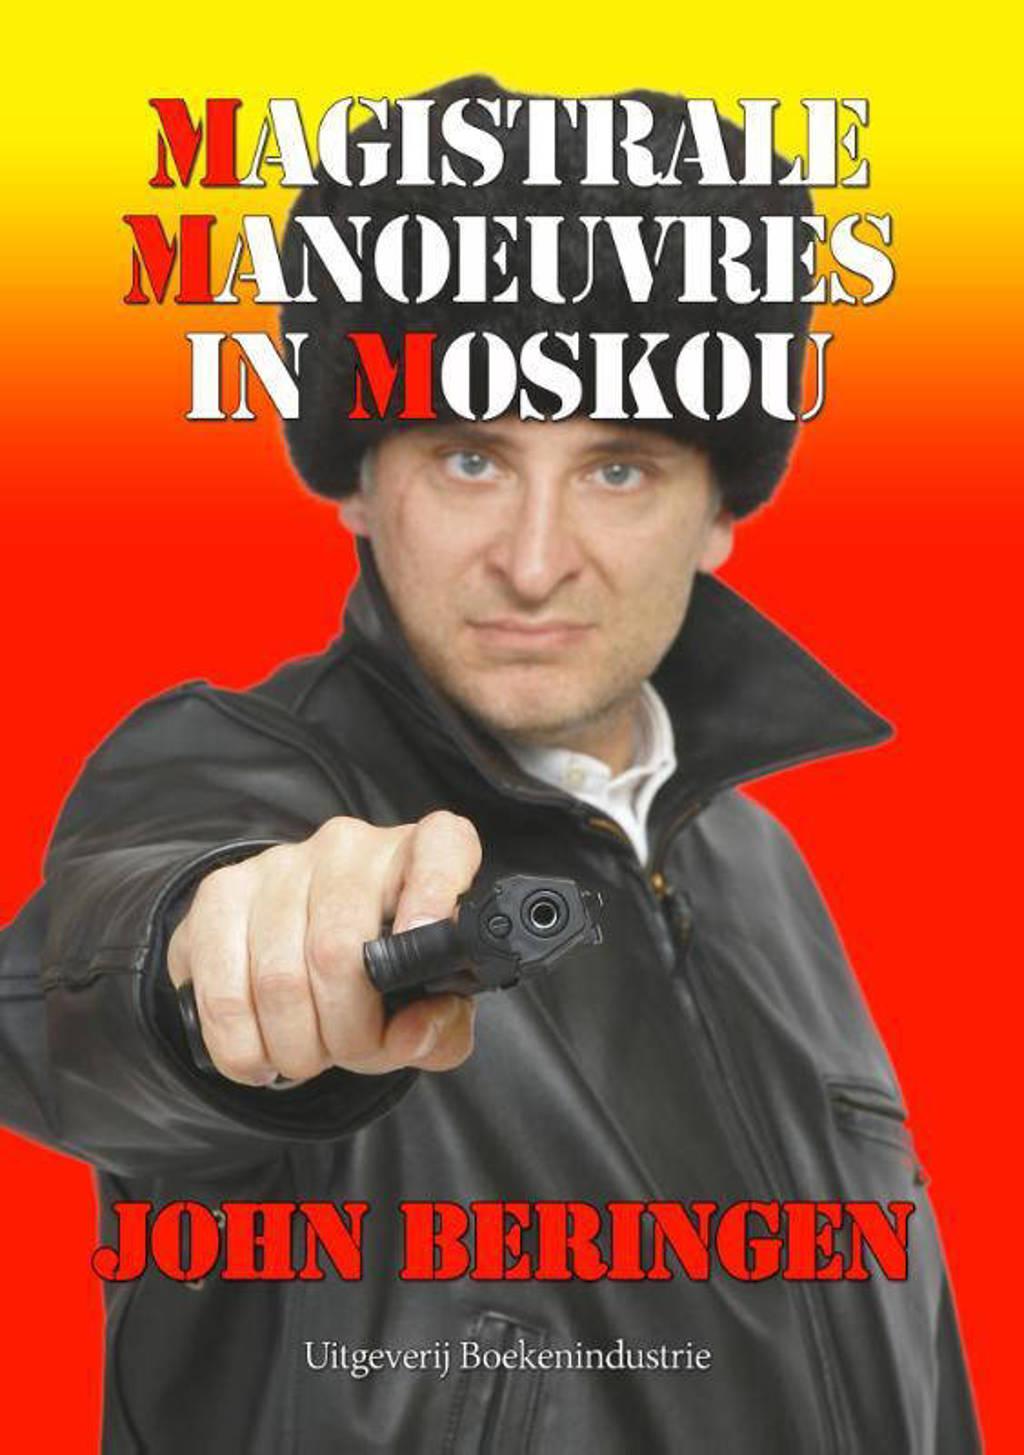 Magistrale manoeuvres in Moskou - John Beringen